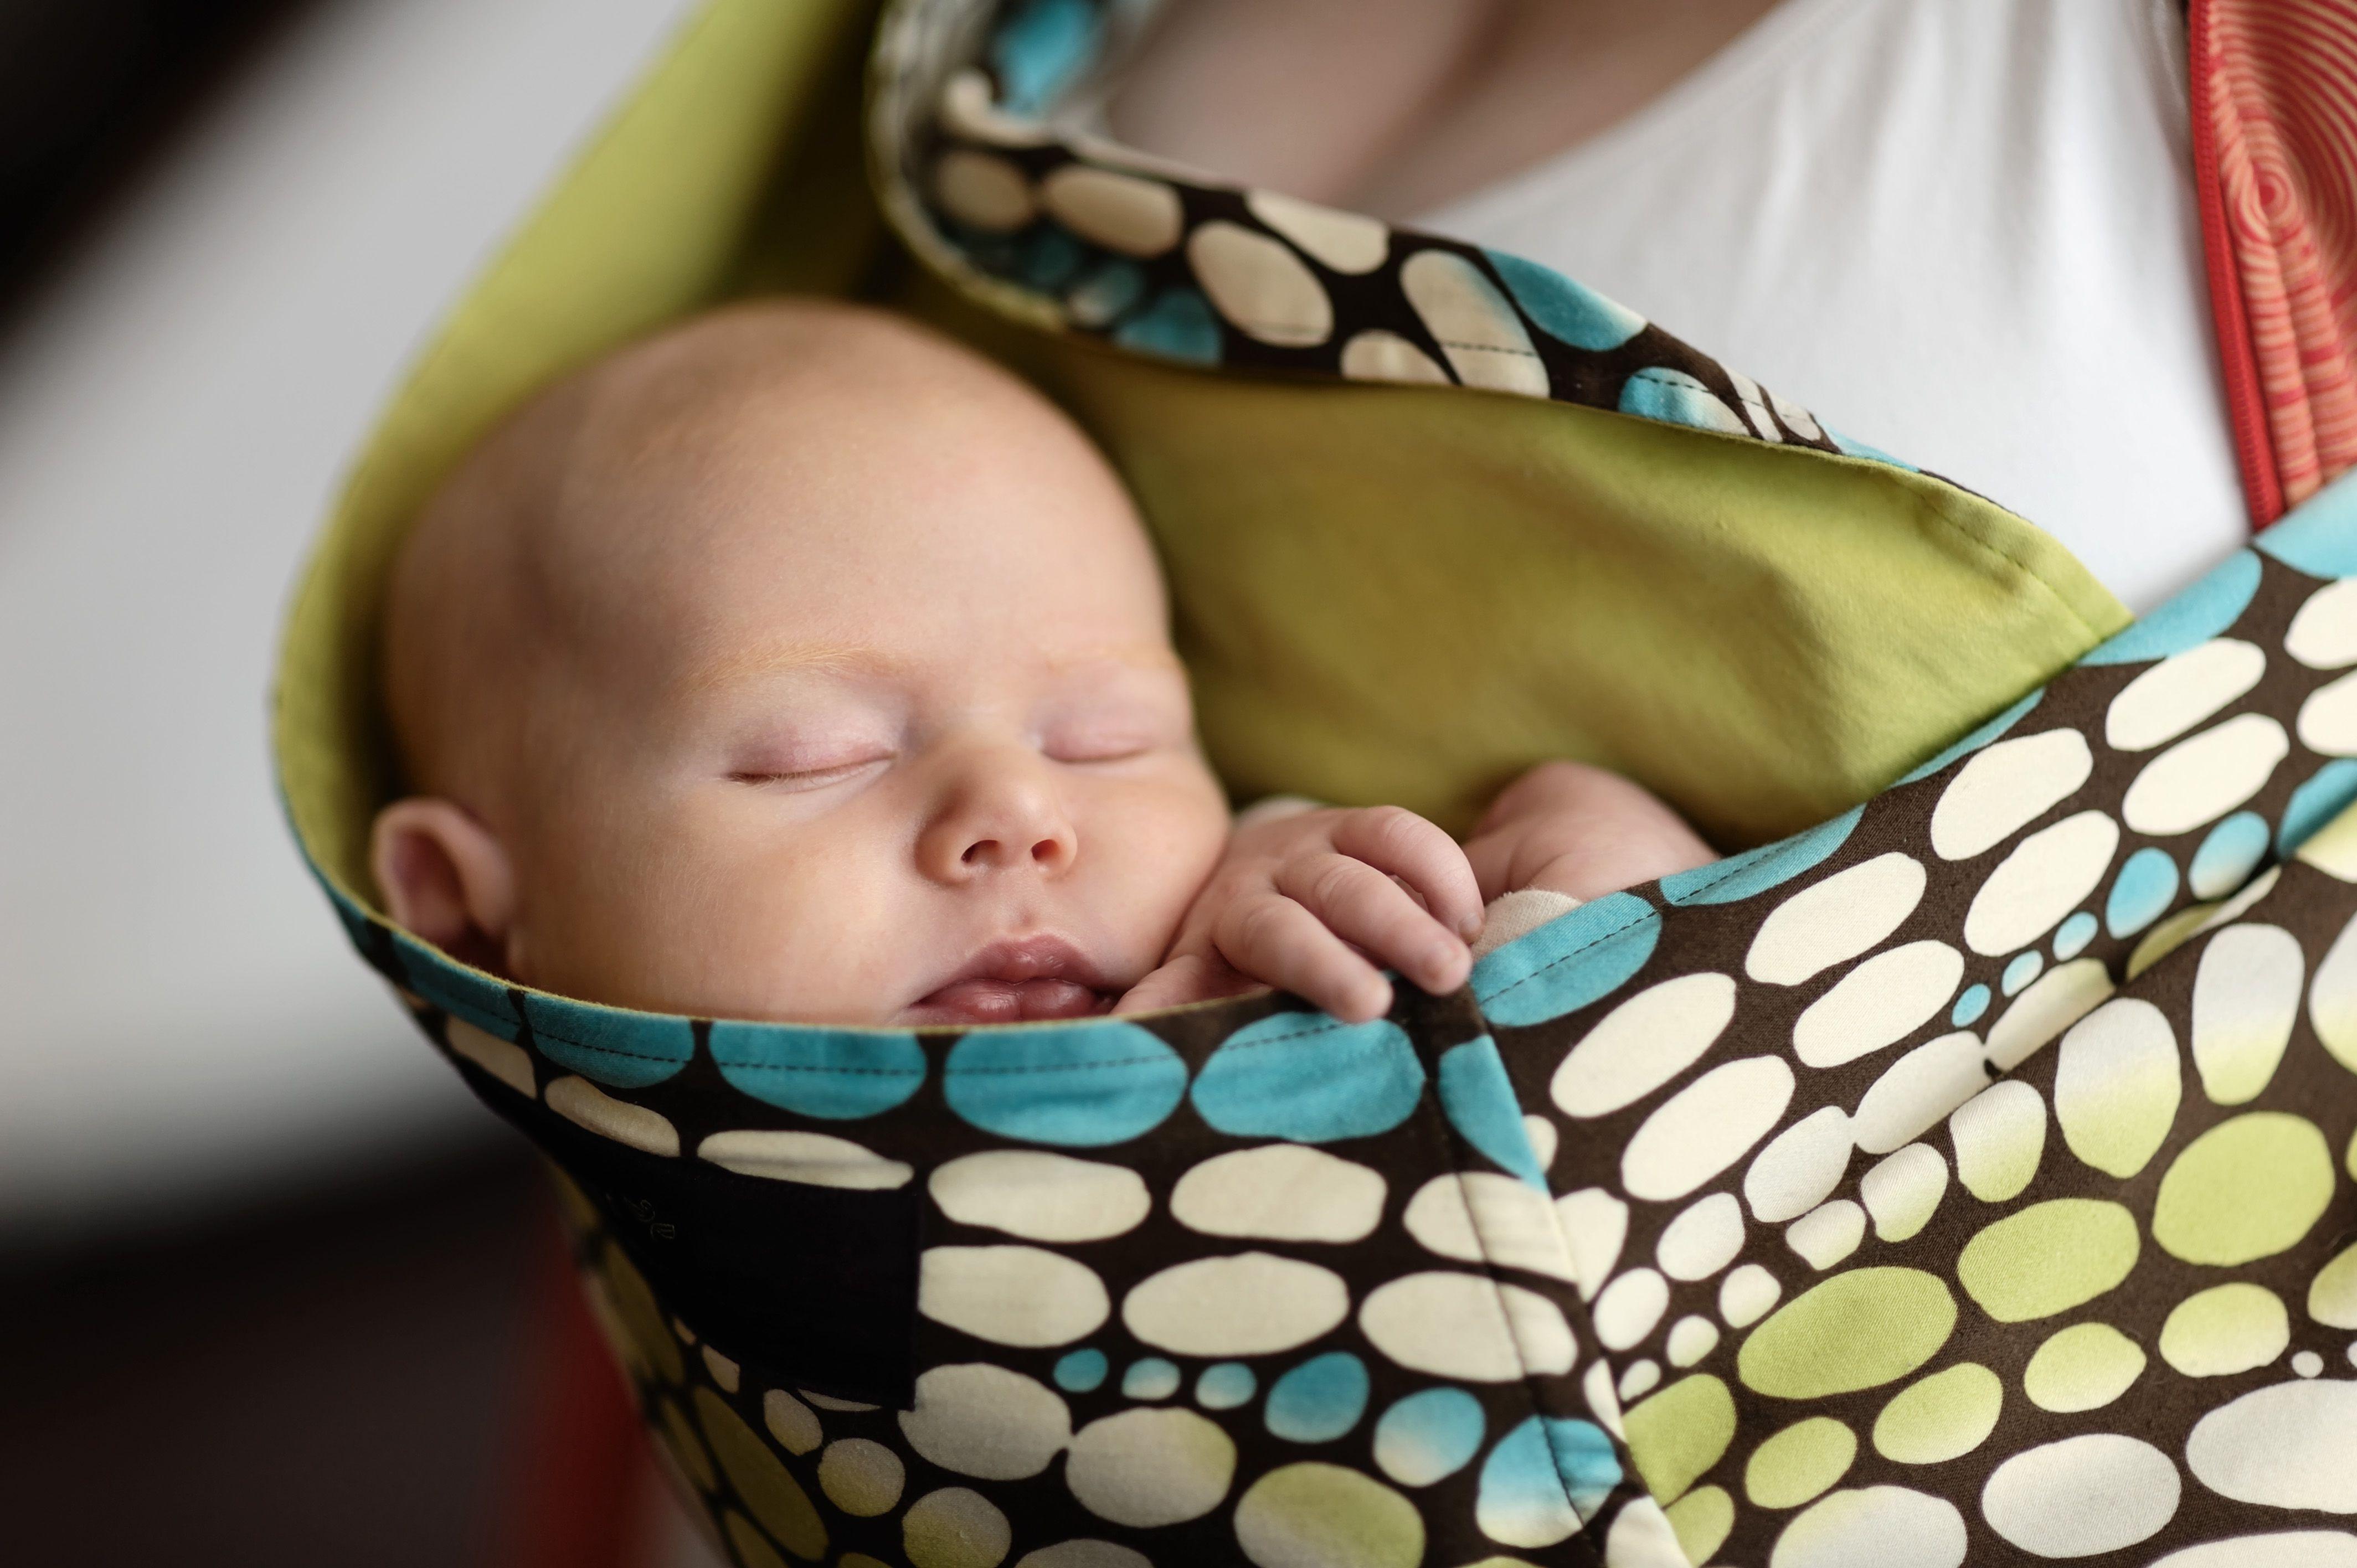 Sleeping baby in a sling